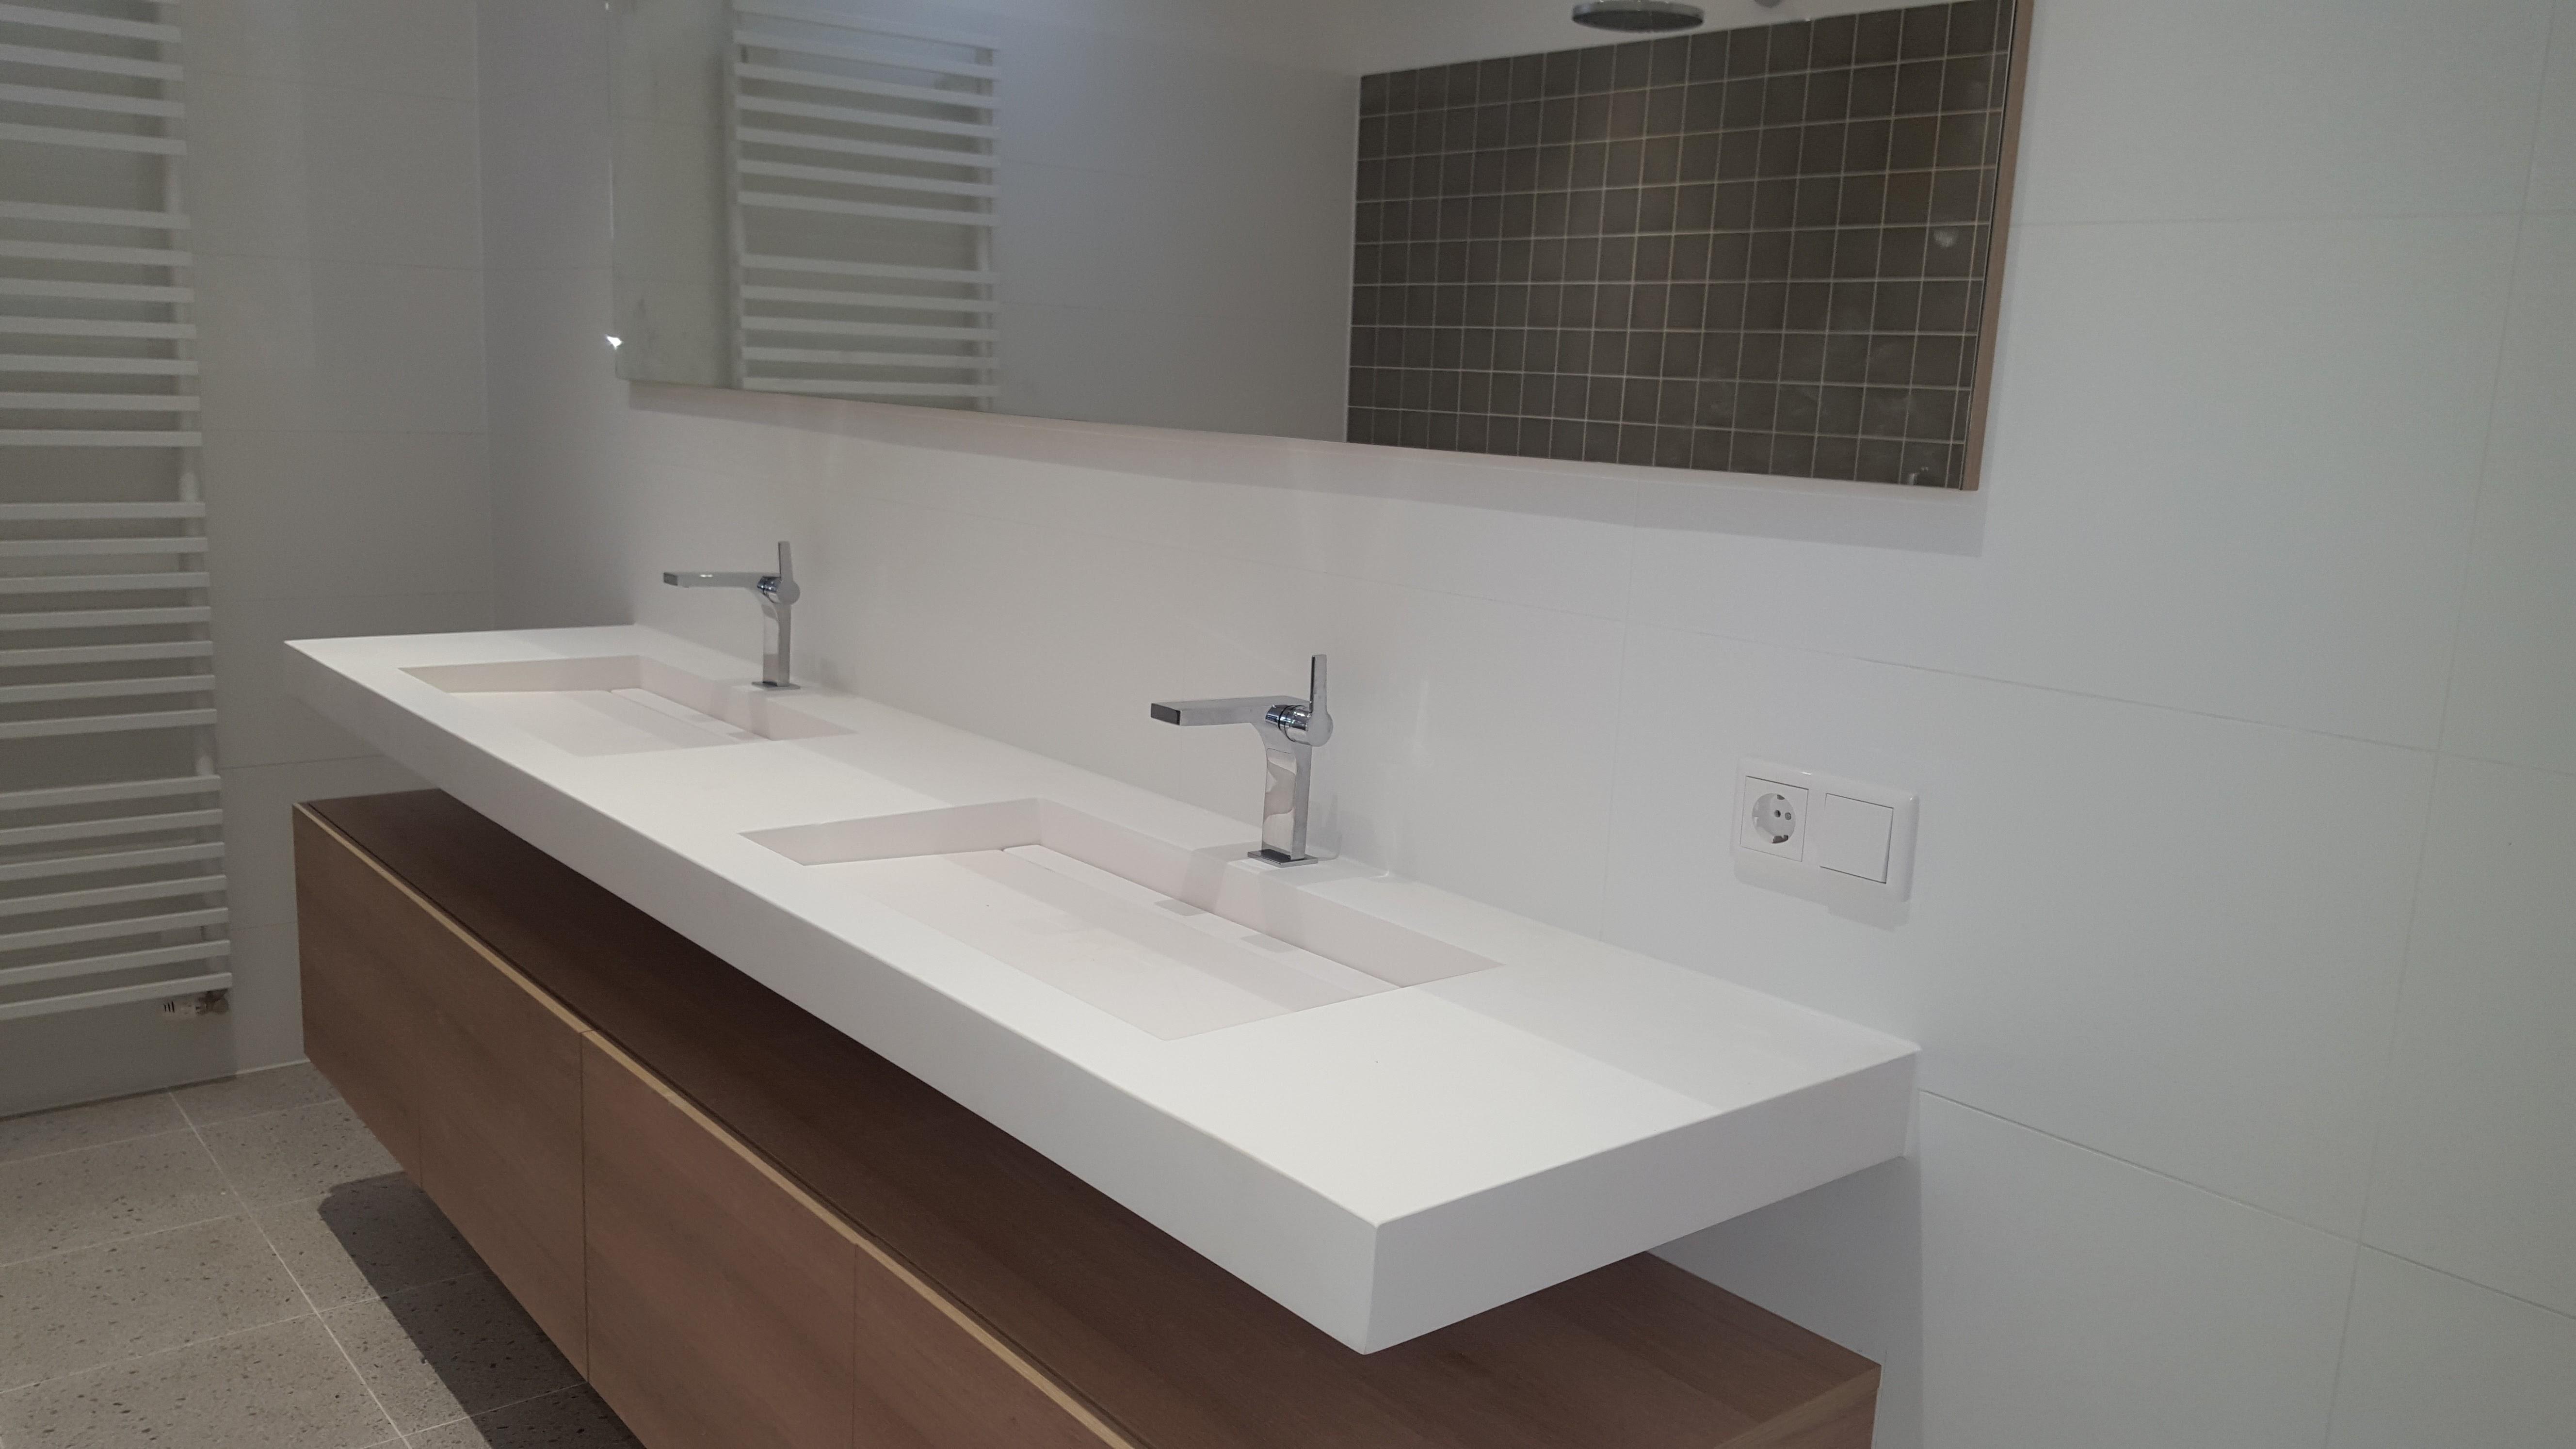 Smalle Badkamer Verzameling : Wasbak badkamer good clou bath findings wasbak wastafel voor